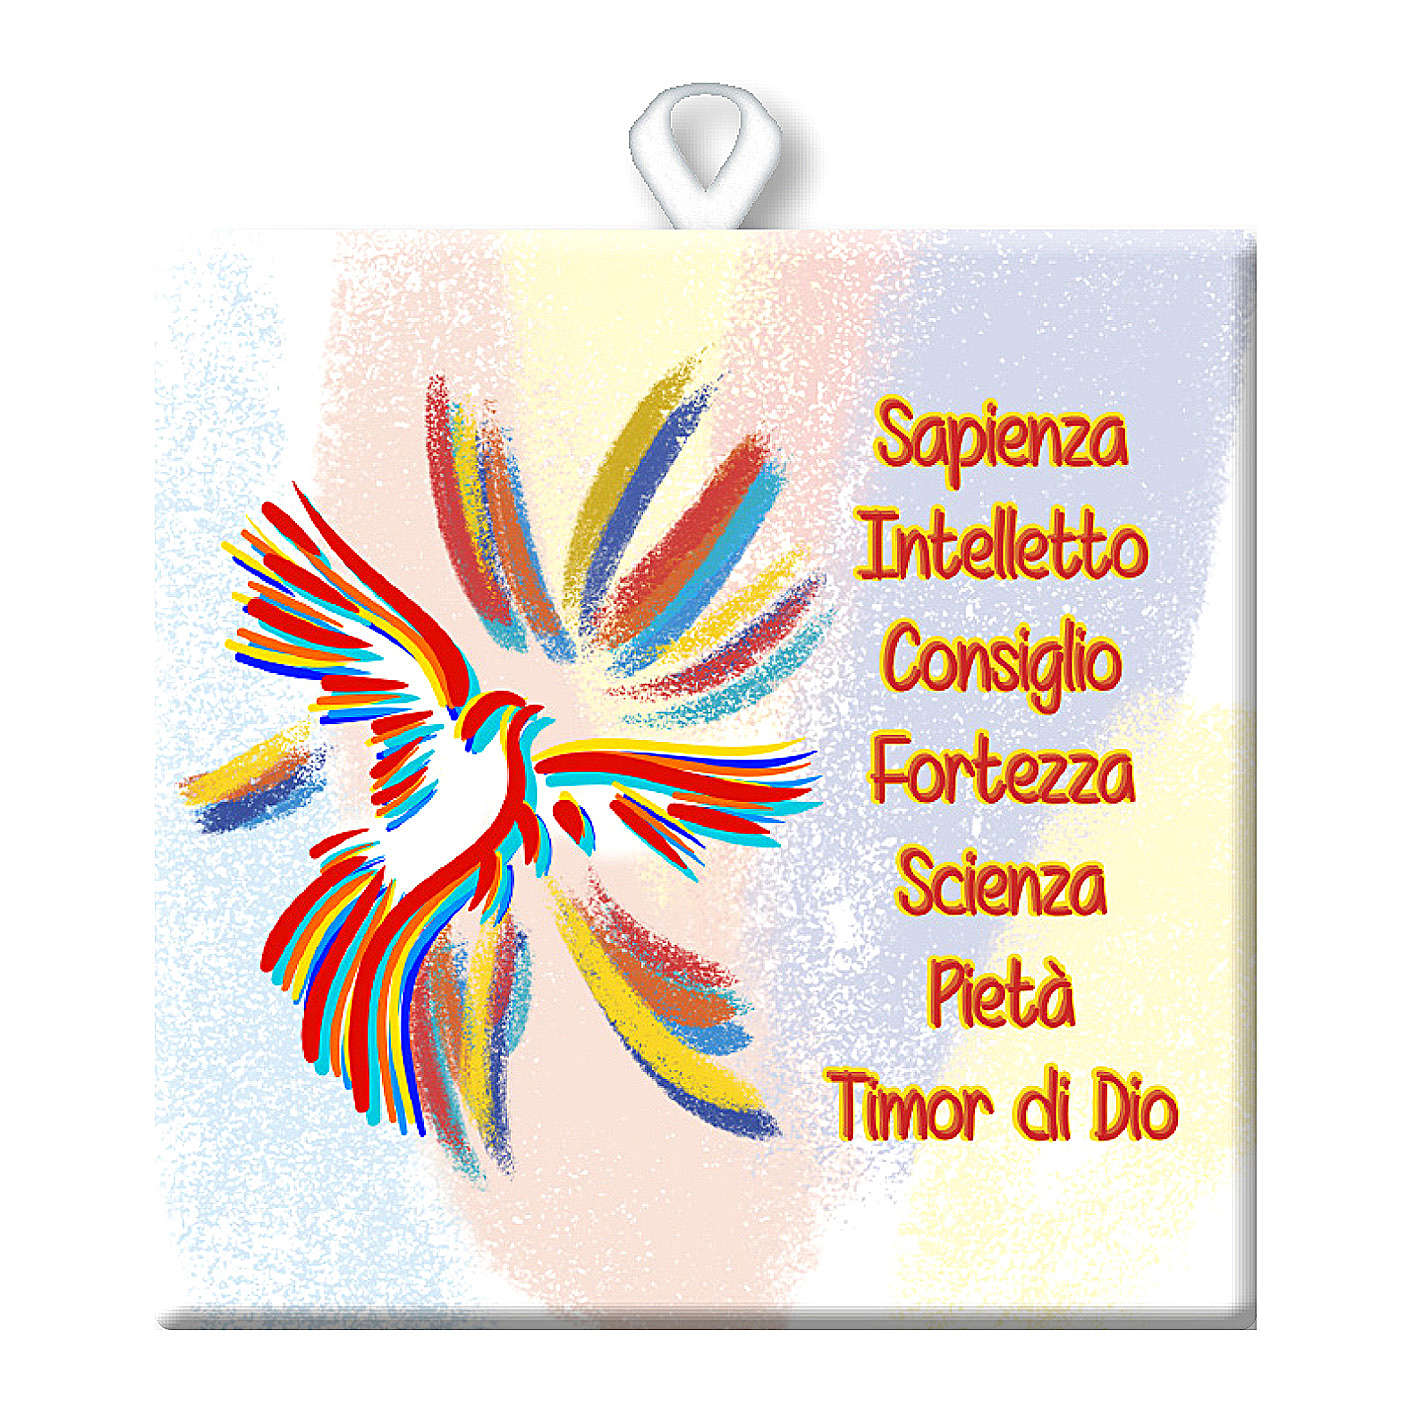 Baldosa cerámica impresa Espíritu Santo y Dones 10x10 cm 3